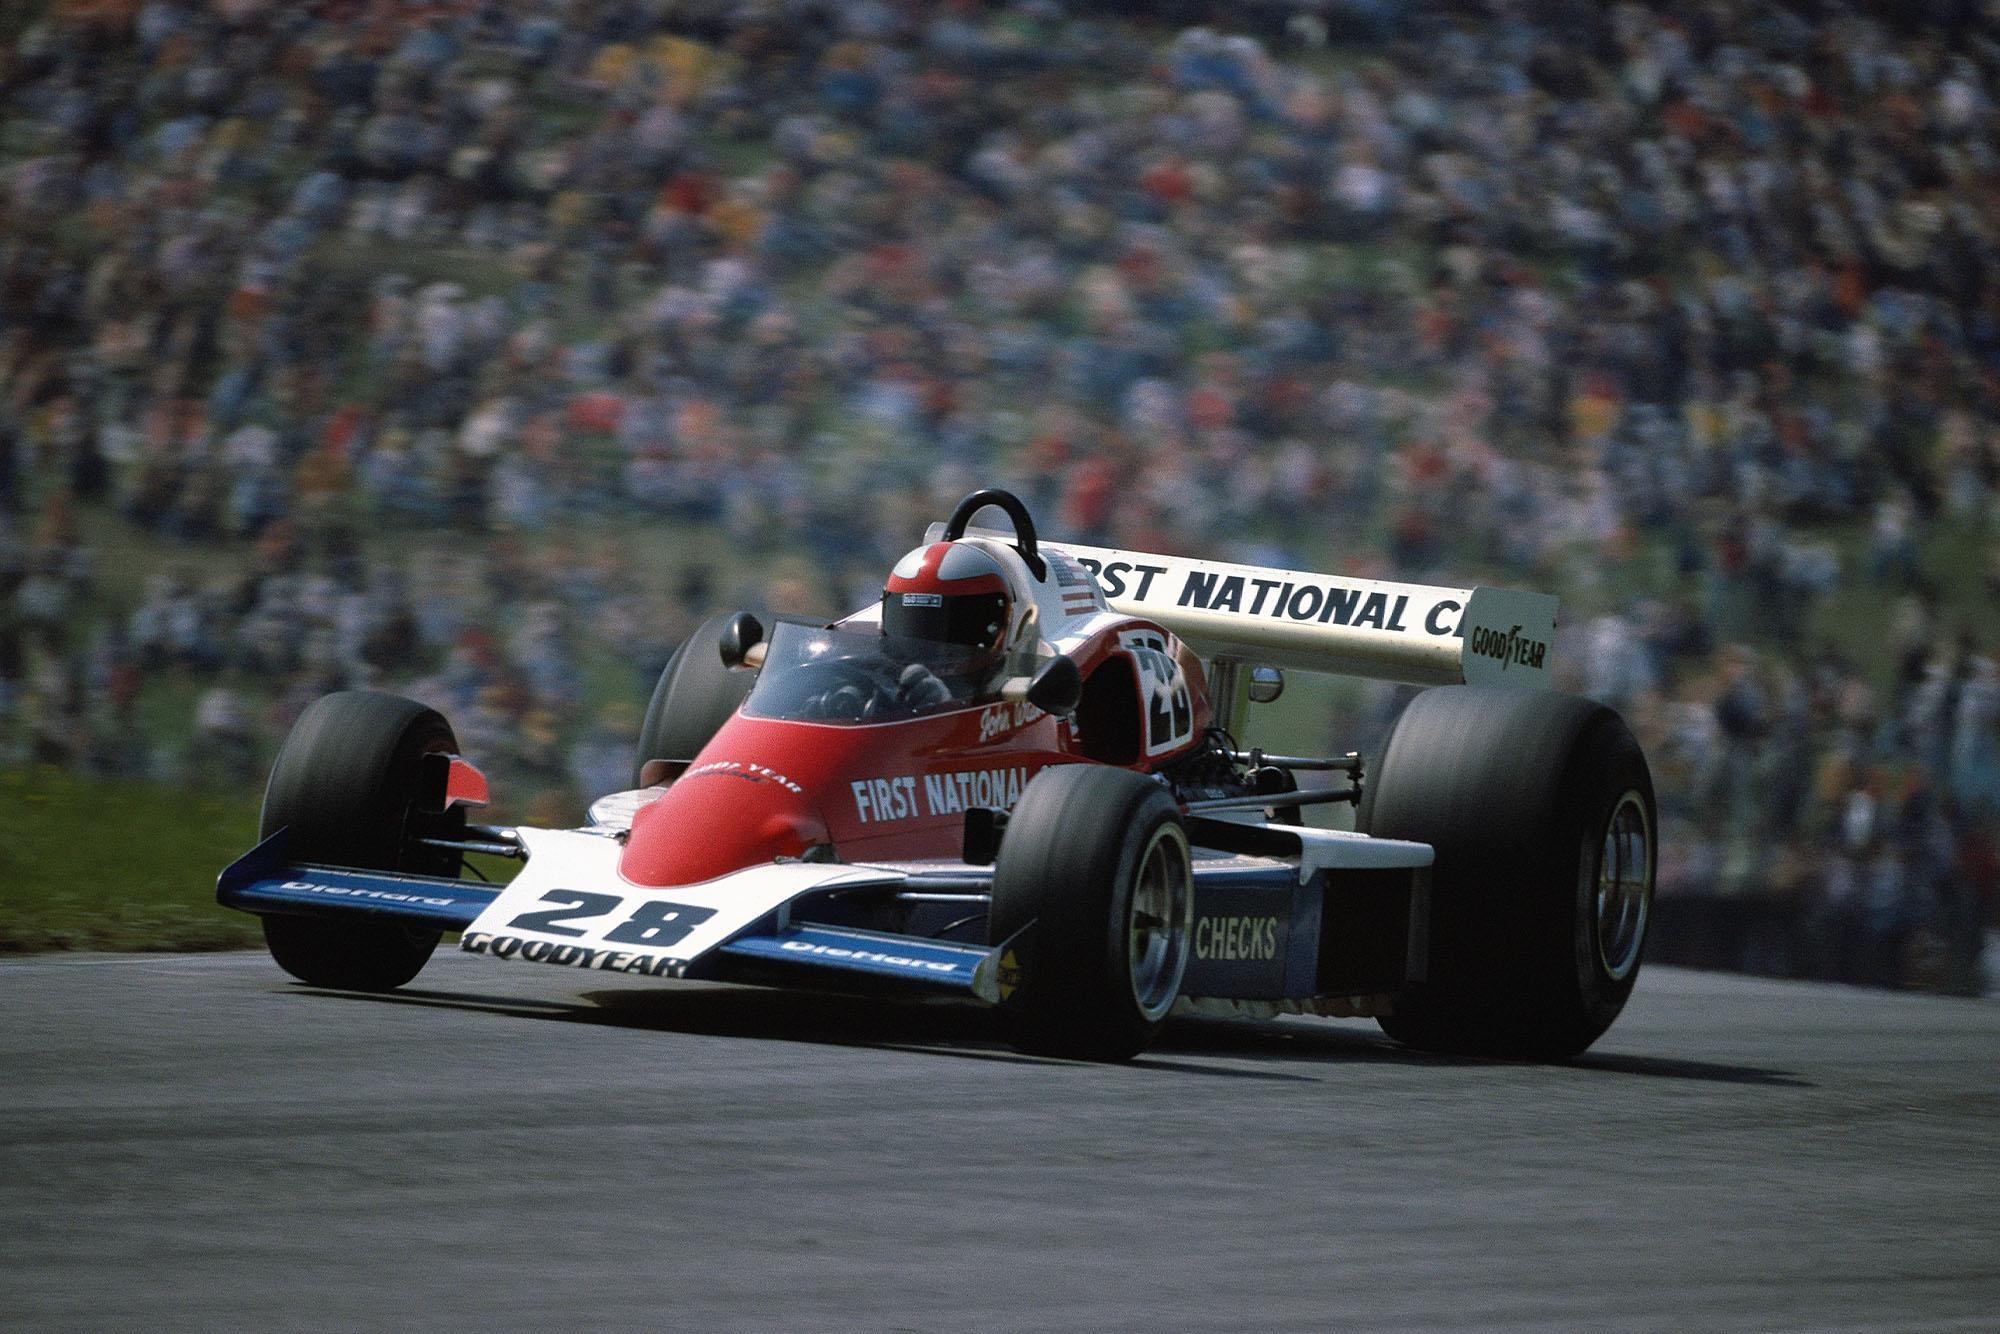 John Watson (Penske) at the 1976 Austrian Grand Prix, Österreichring.